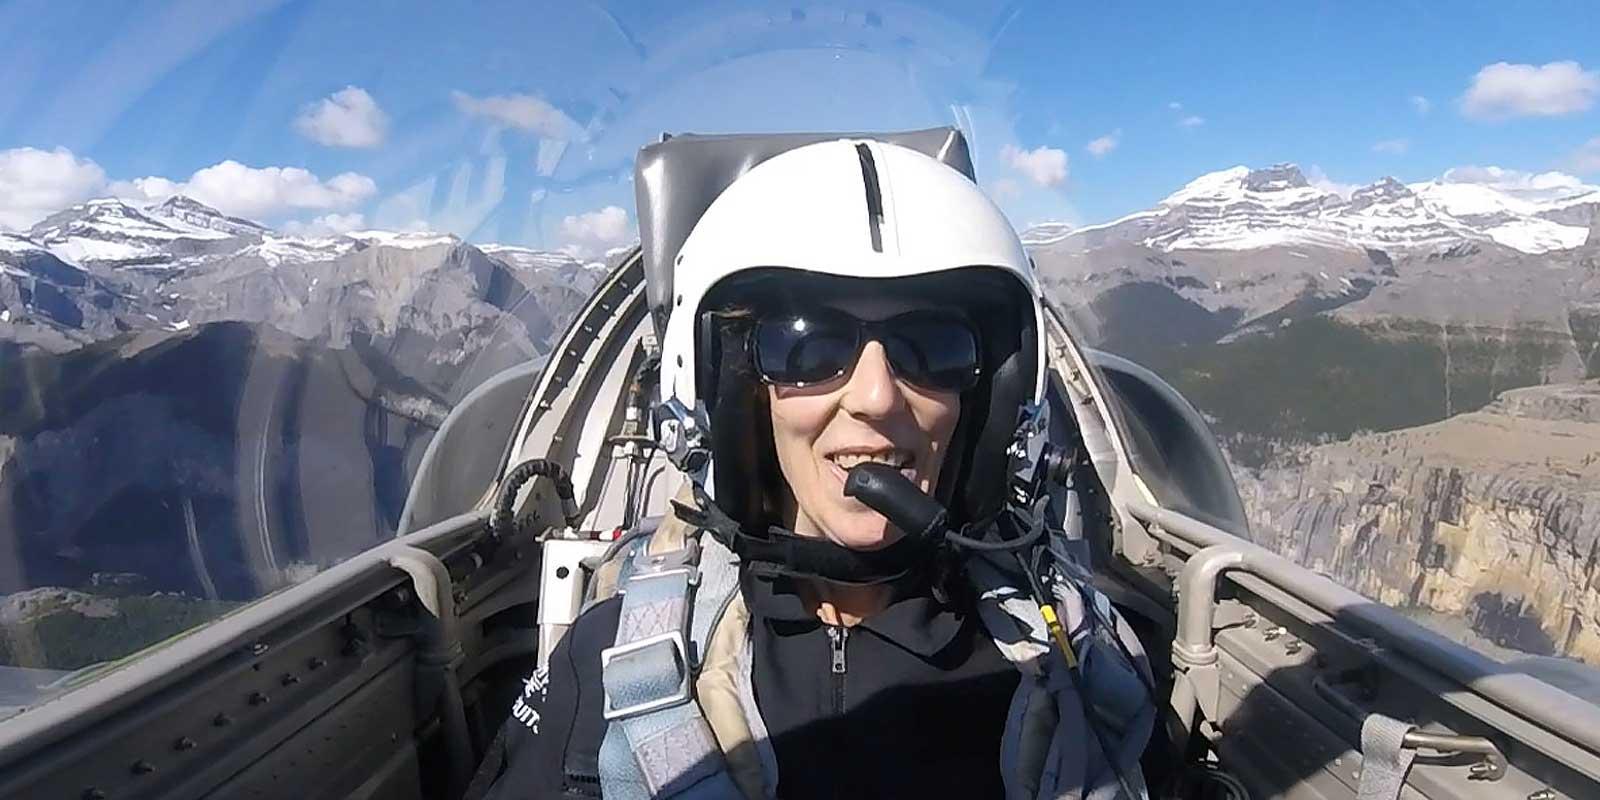 Fighter Jet Flying in Calgary